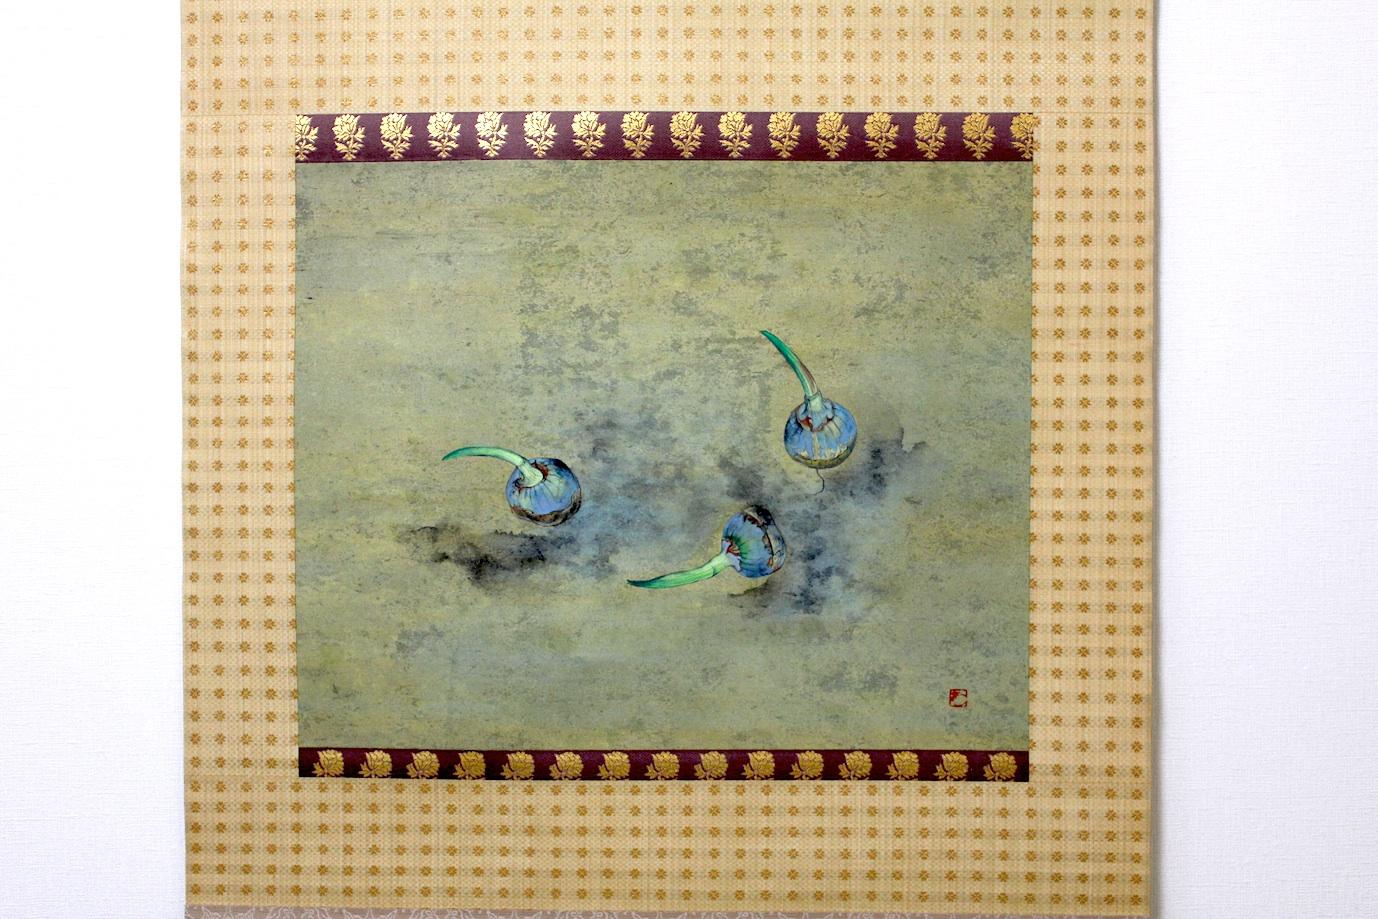 Aguri Uchida  / 内田あぐり  慈姑の図    日本画、掛け軸 1995年頃